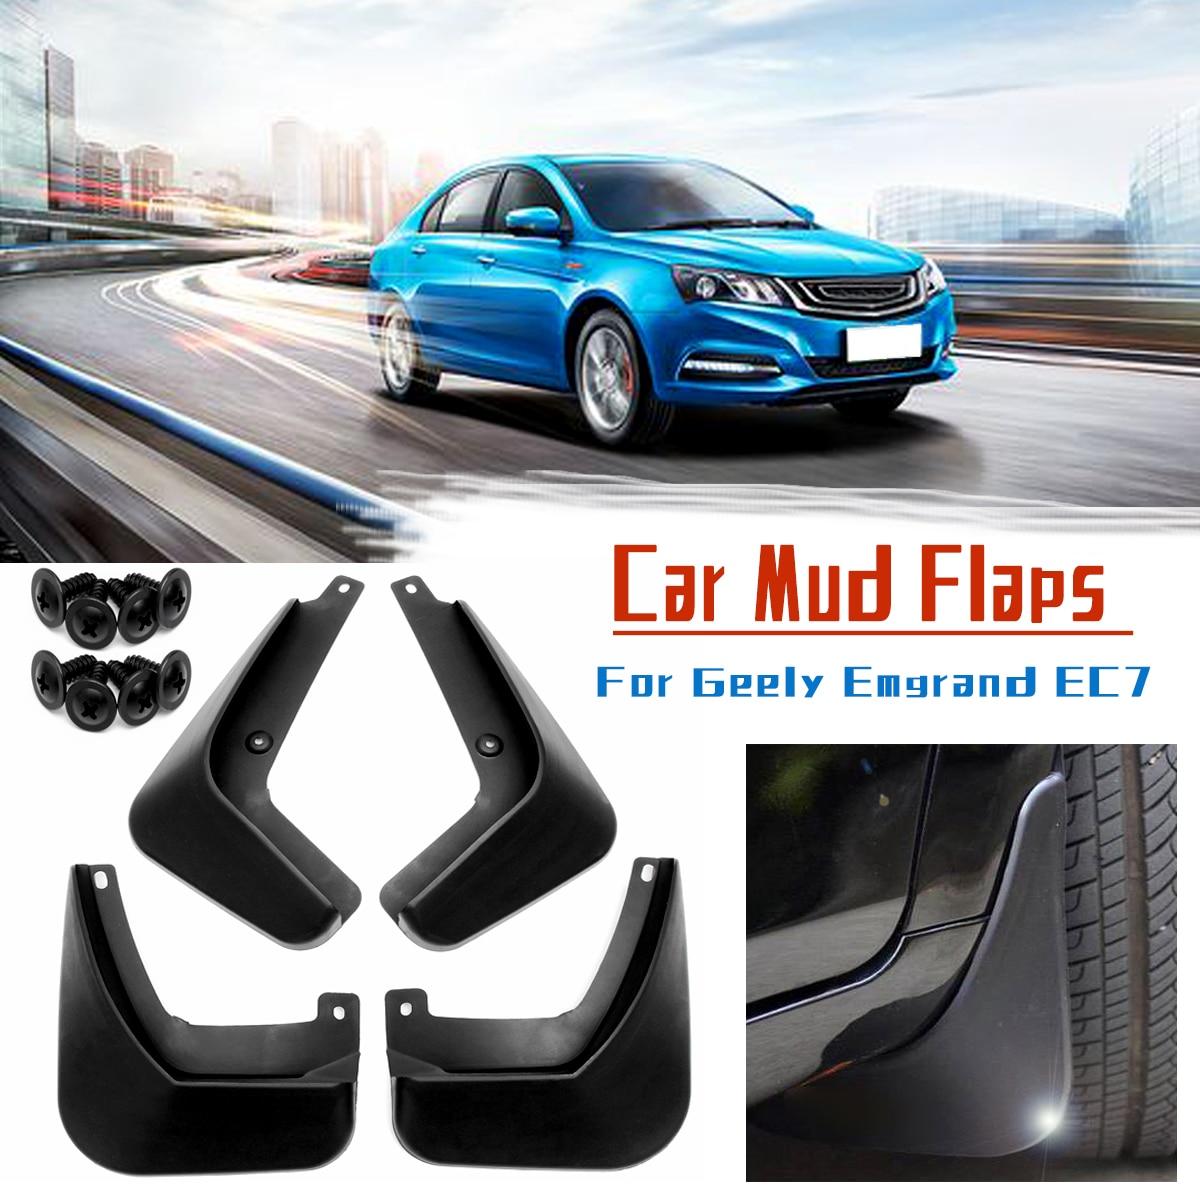 4pcs Car Front Rear Mud Flaps Mudguards Fender Flares Mud Splash Guards Mudflap For Geely Emgrand 2017 2018